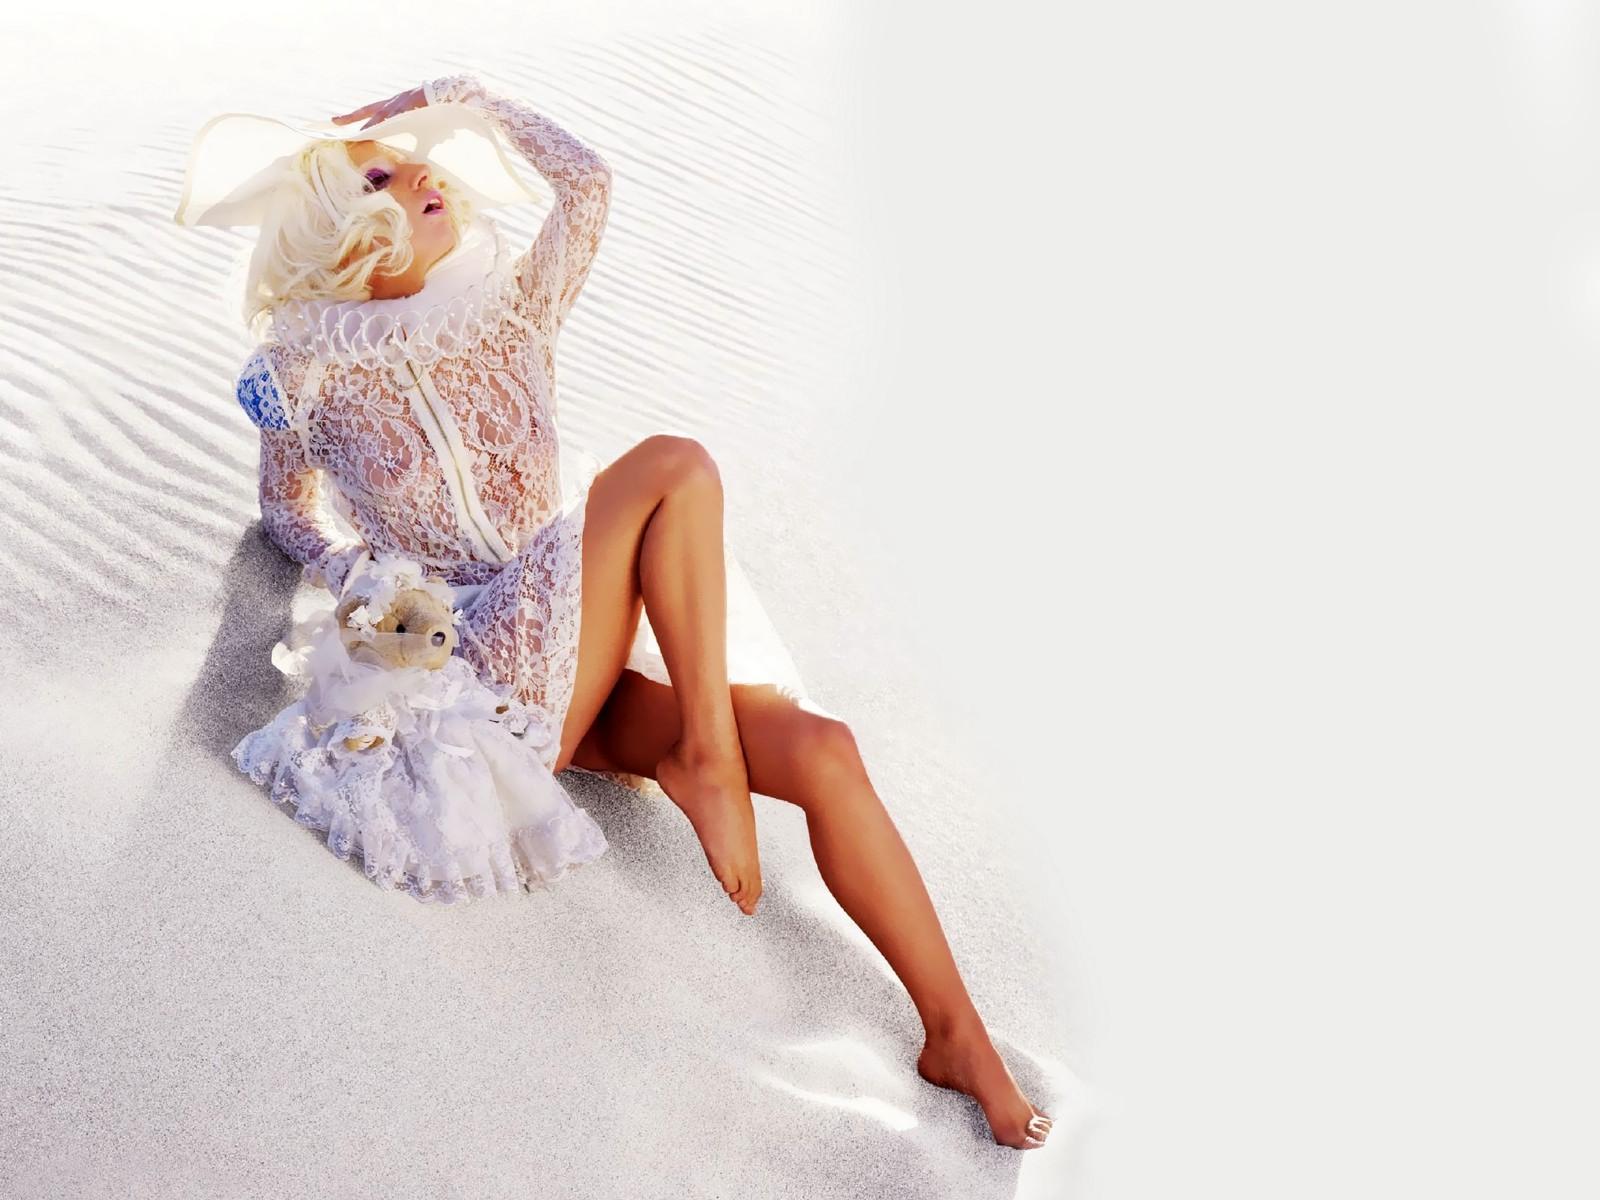 http://2.bp.blogspot.com/-a6zvvWx-9gg/TepaBkxCfeI/AAAAAAAAB10/V8oJZExsUE0/s1600/Lady-Gaga-Wallpaper-6.jpg